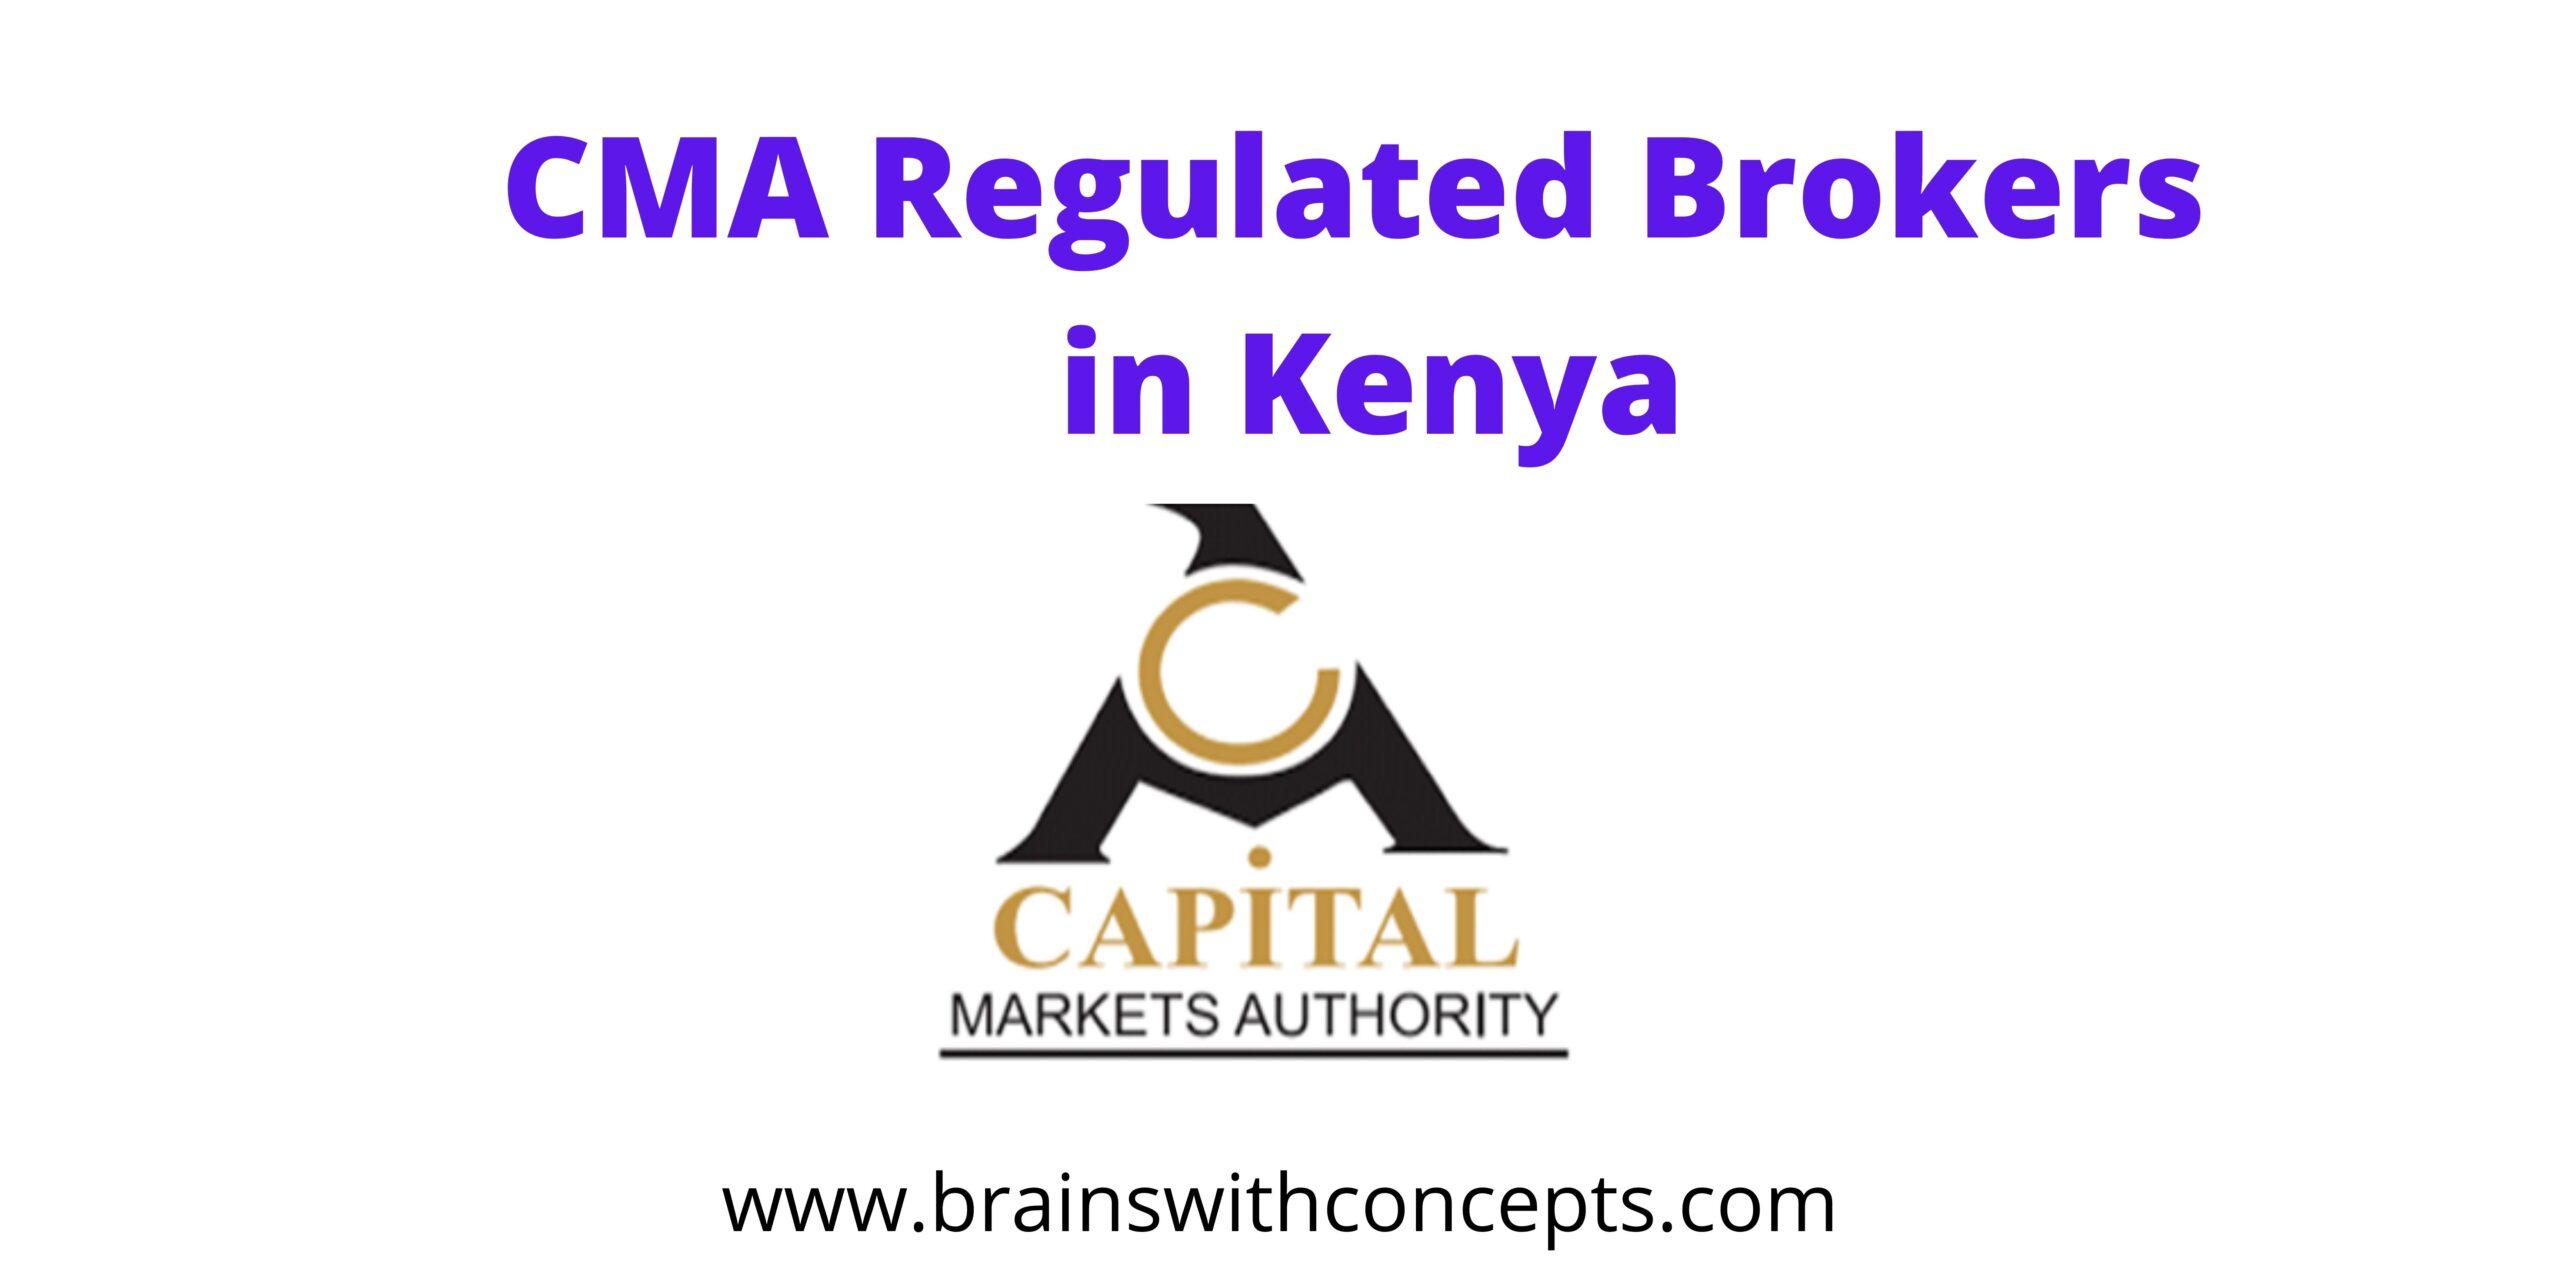 CMA regulated brokers